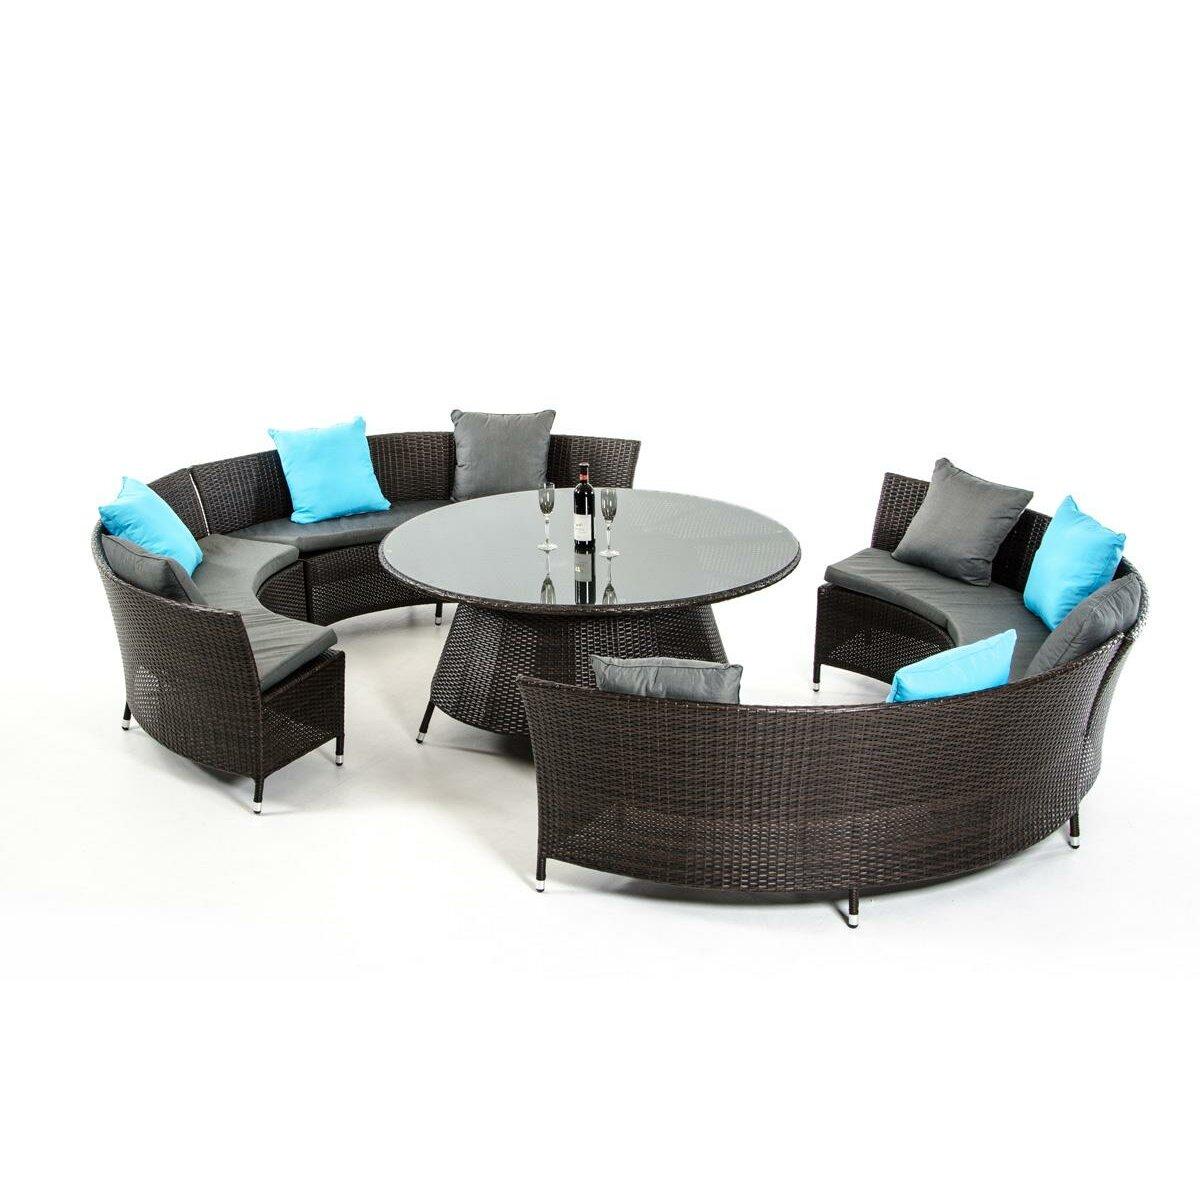 Vig Furniture Renava Luxemburg 5 Piece Dining Set With Cushions Reviews Wayfair